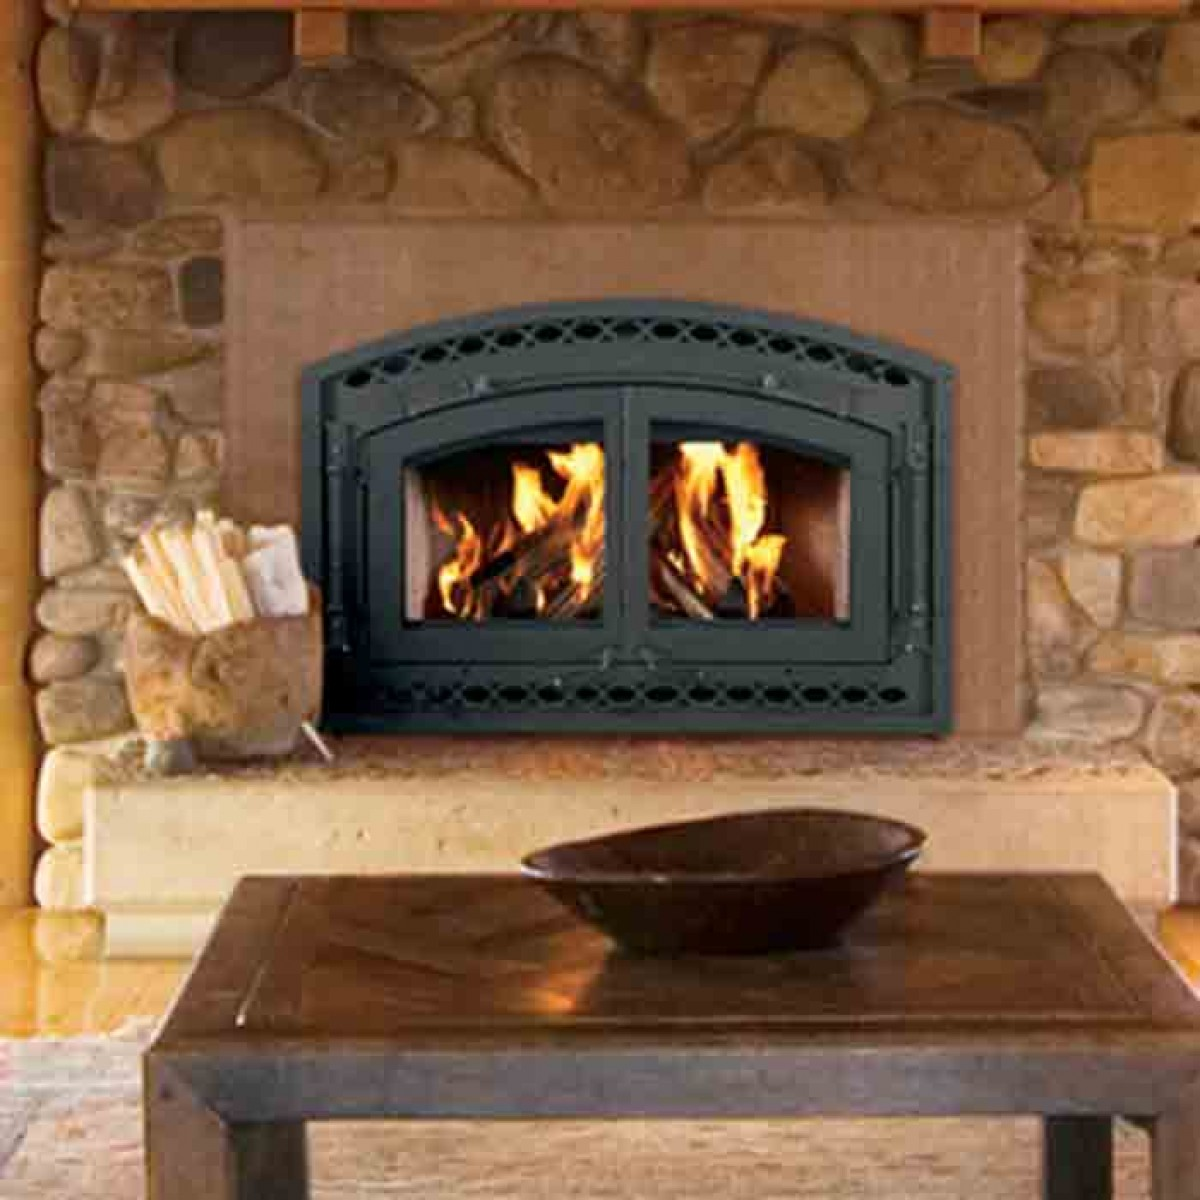 Ihp Superior Wct6900 Epa Ii Certified Wood Burning Fireplace